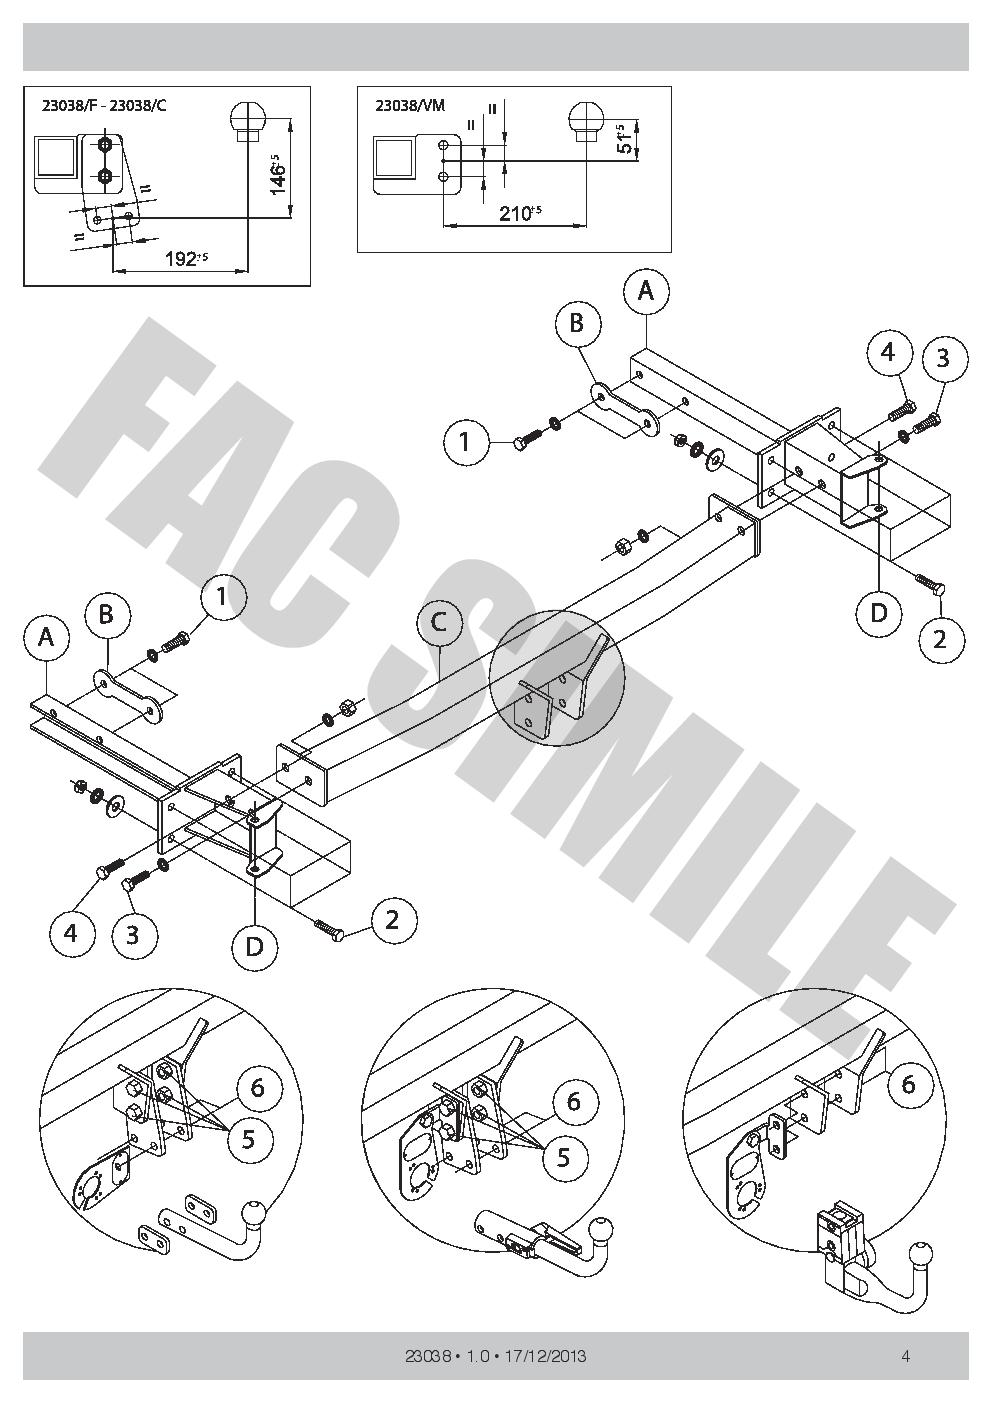 Fixed Swan Neck Towbar For Mercedes E Class Estate 2002-2009 23038//F/_H1